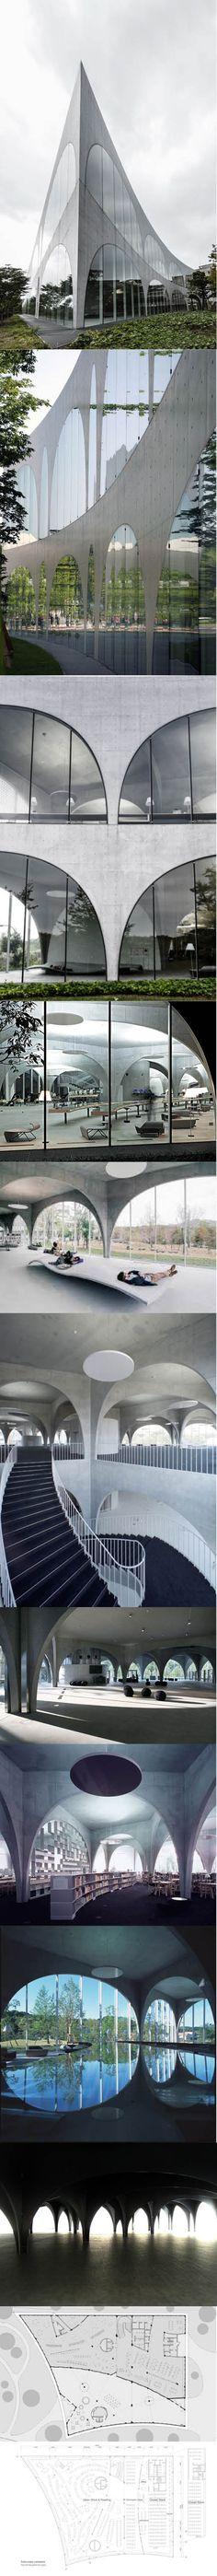 2007 Toyo Ito - Library at Tama Art University / Tokyo Japan / concrete / glass